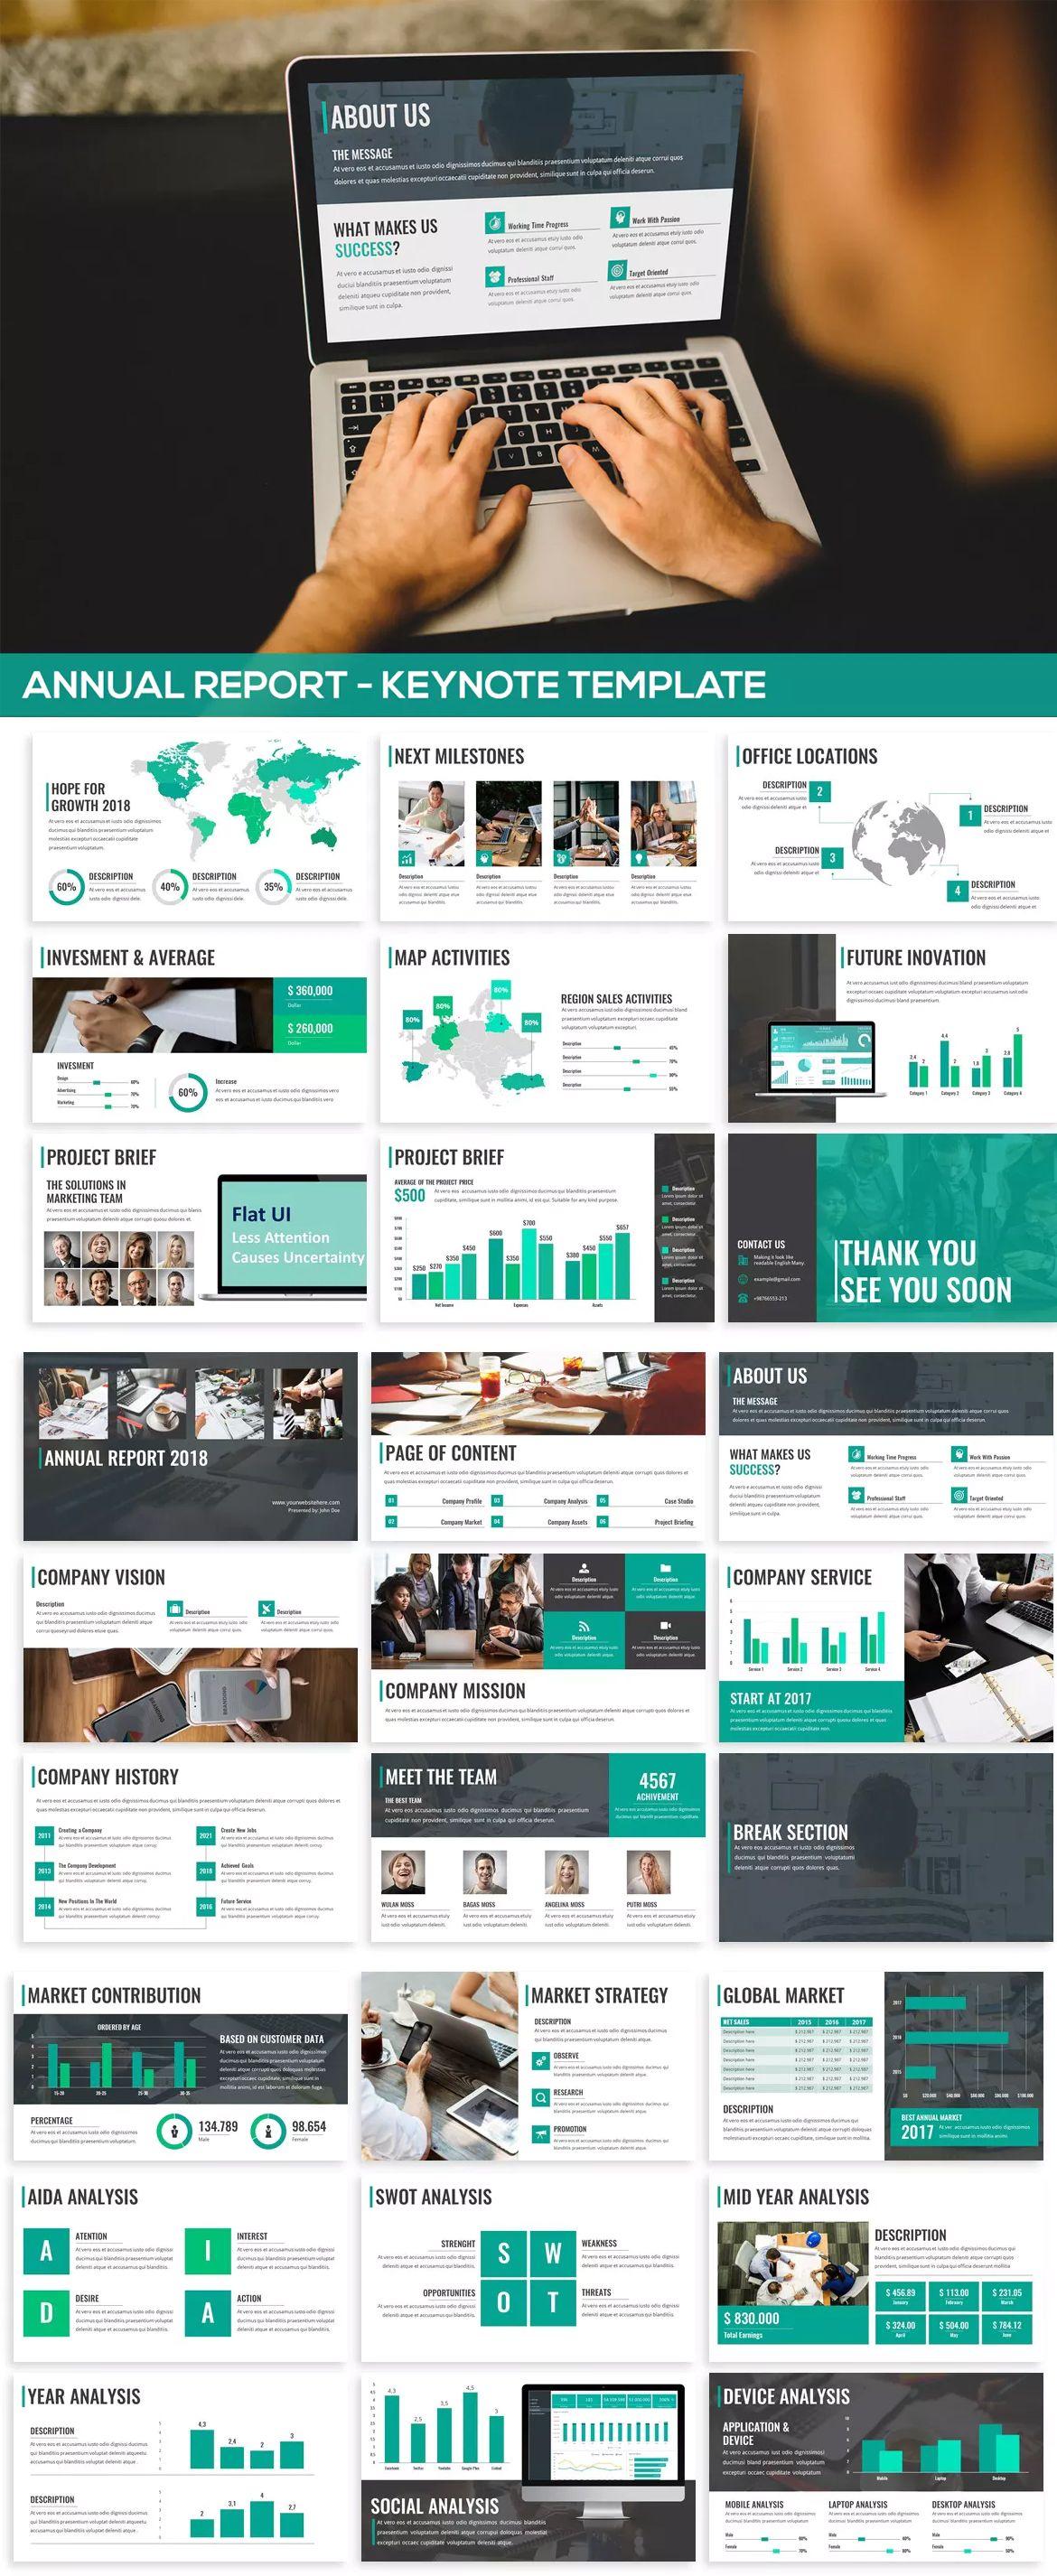 annual report - keynote presentation template - 1200 total slides, Latest Presentation Templates, Powerpoint templates